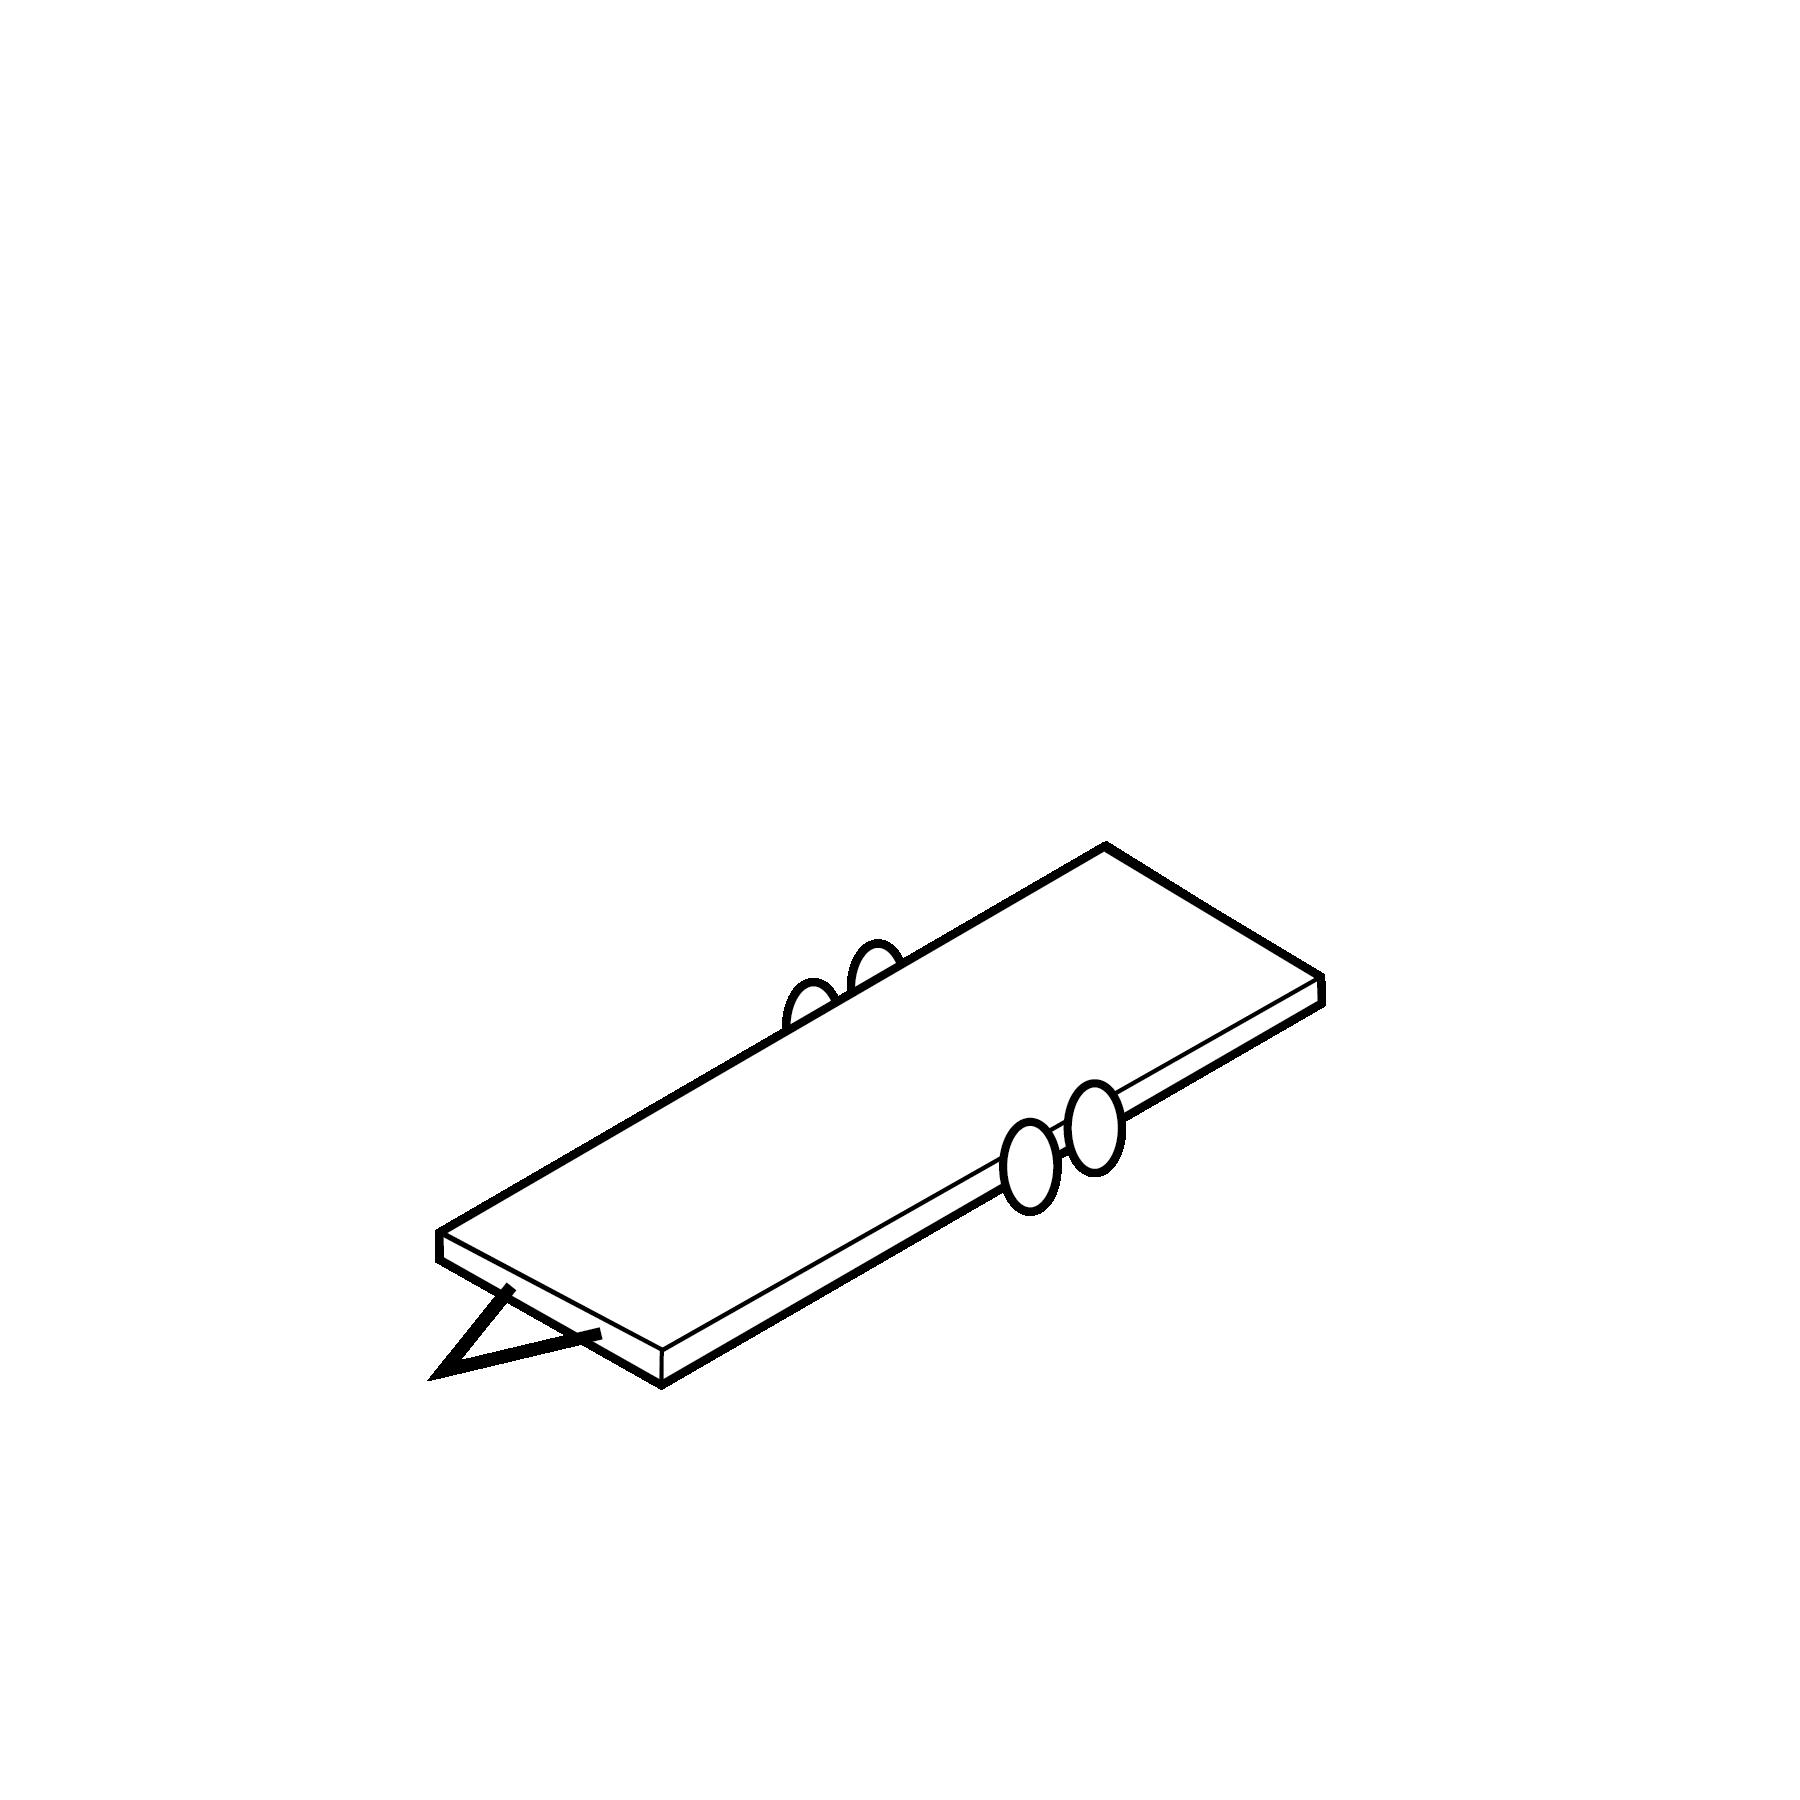 form diagram-01.png